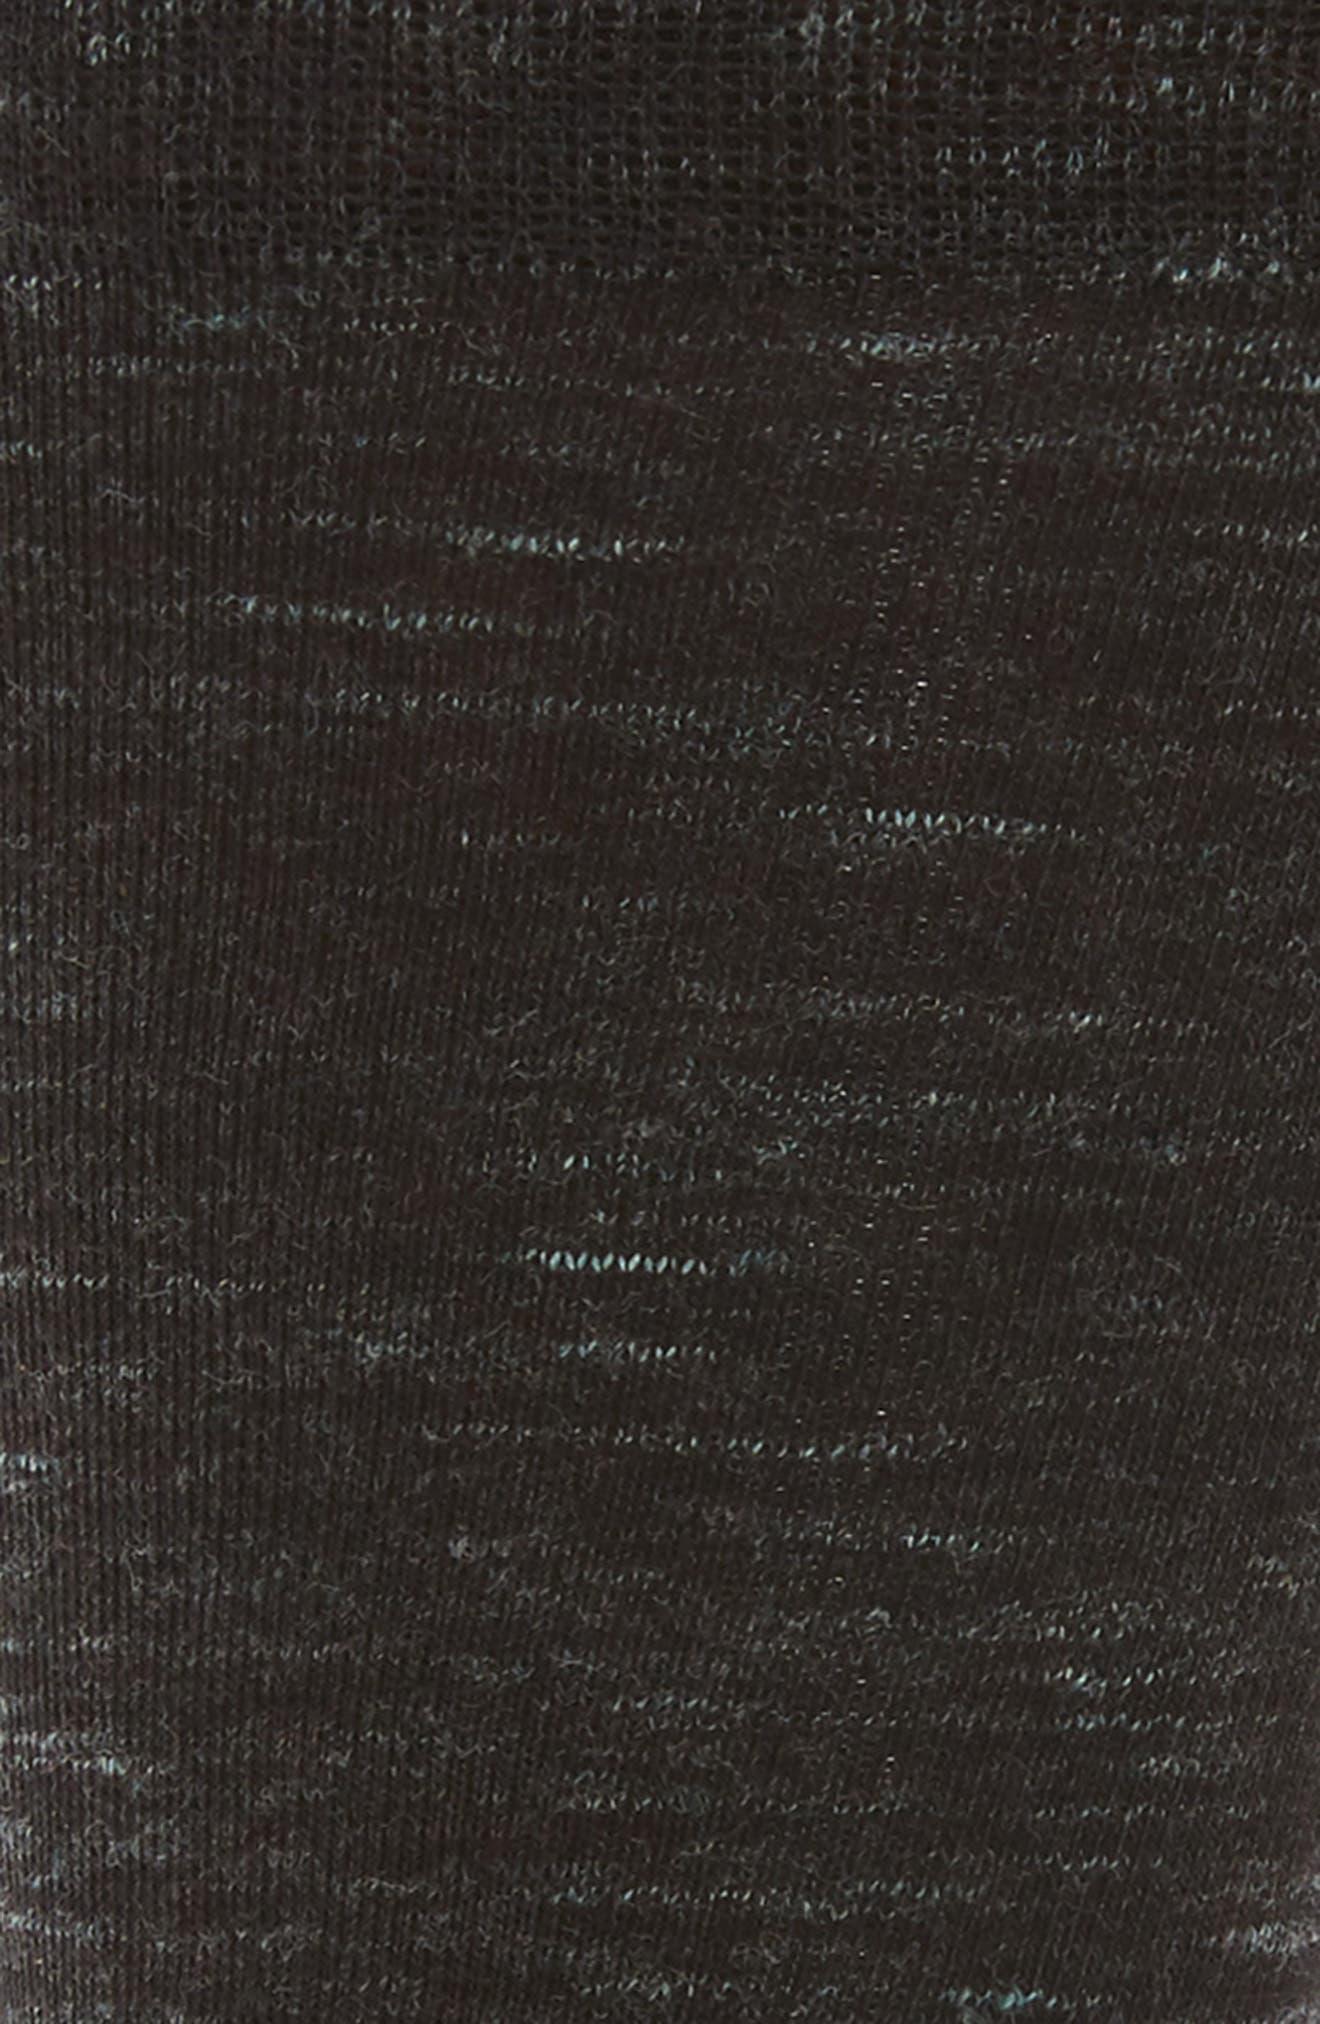 Twist Socks,                             Alternate thumbnail 2, color,                             BLACK